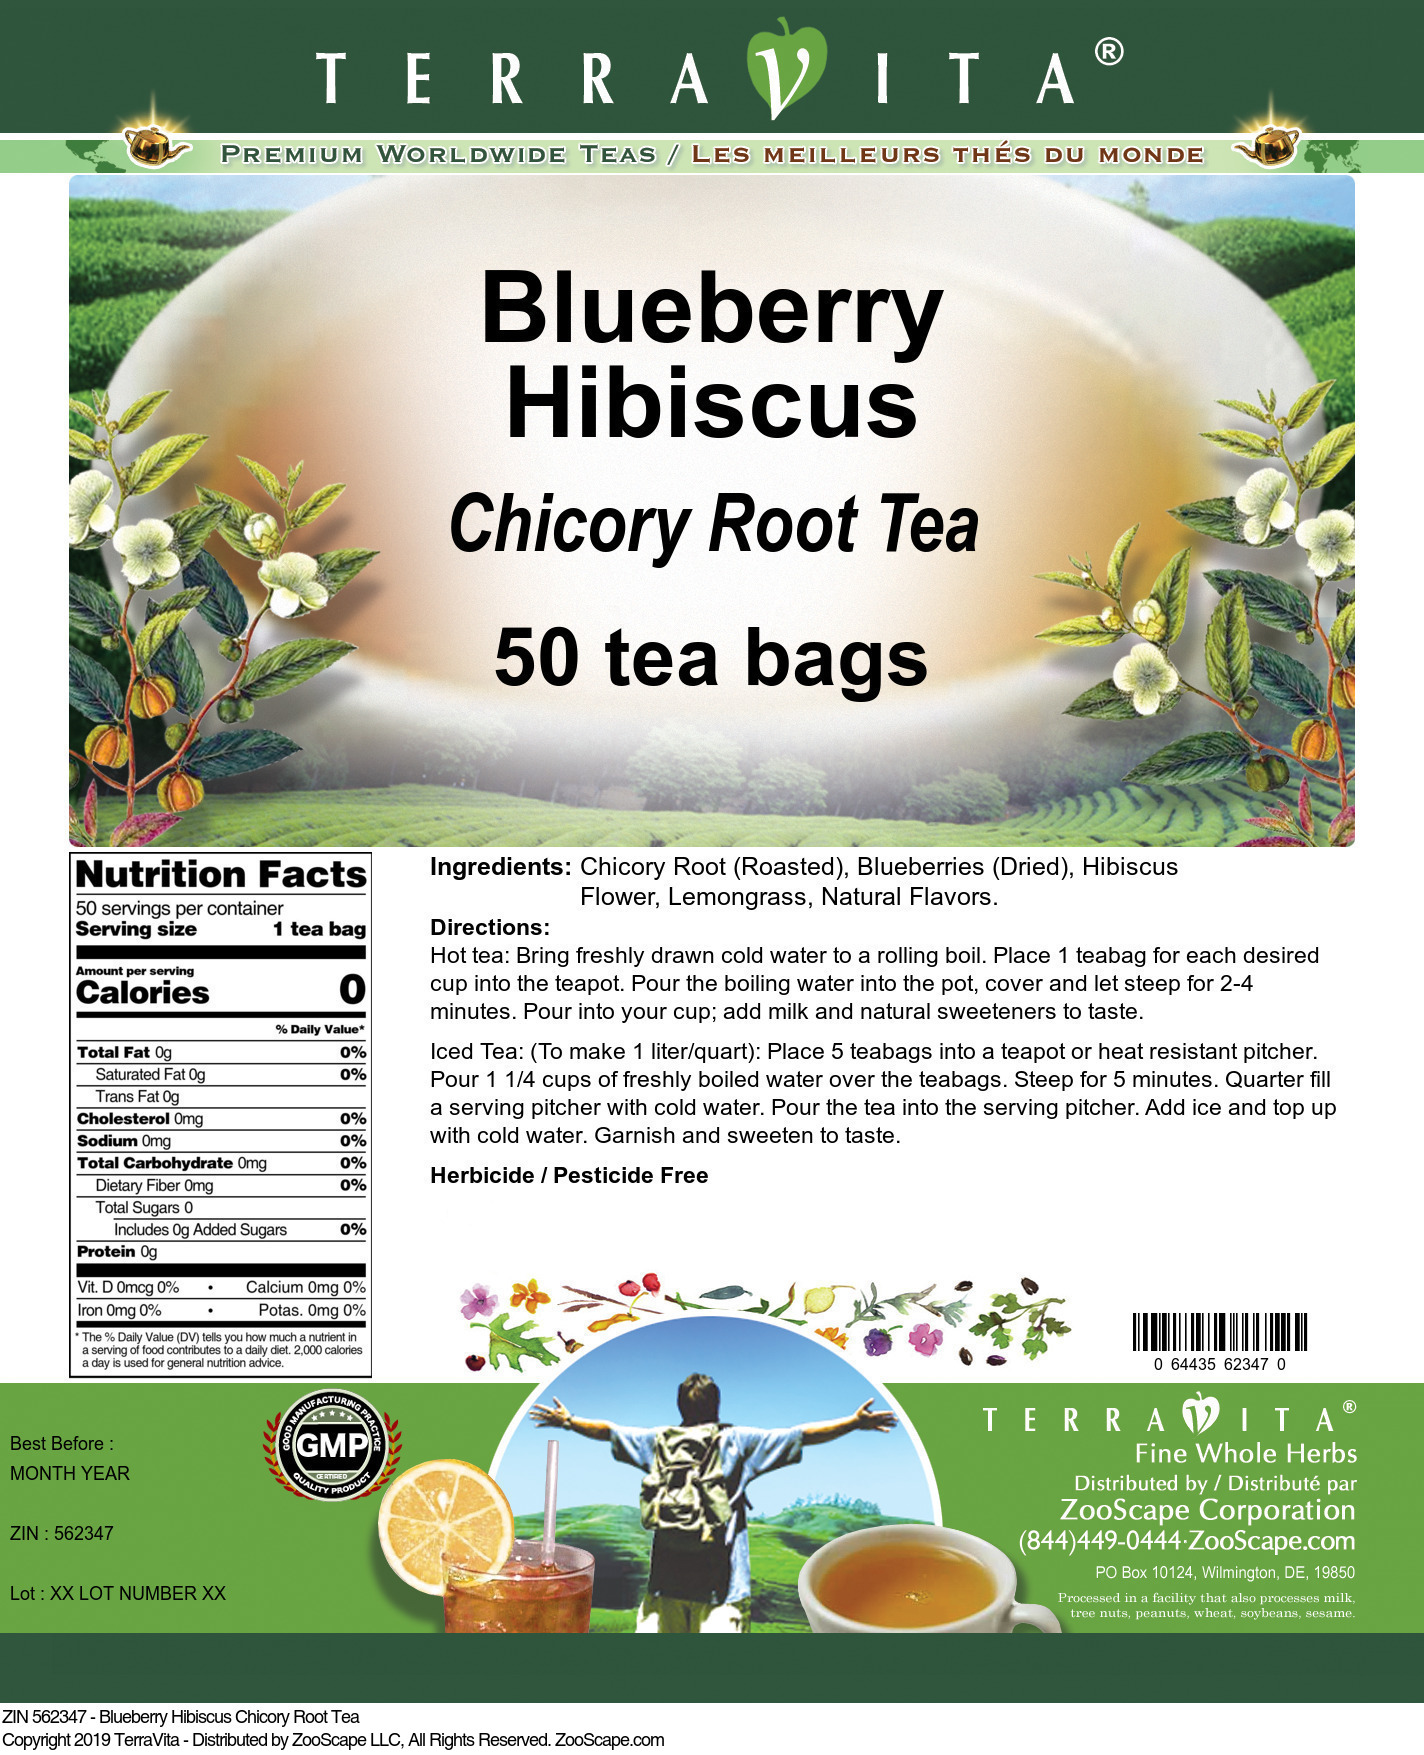 Blueberry Hibiscus Chicory Root Tea